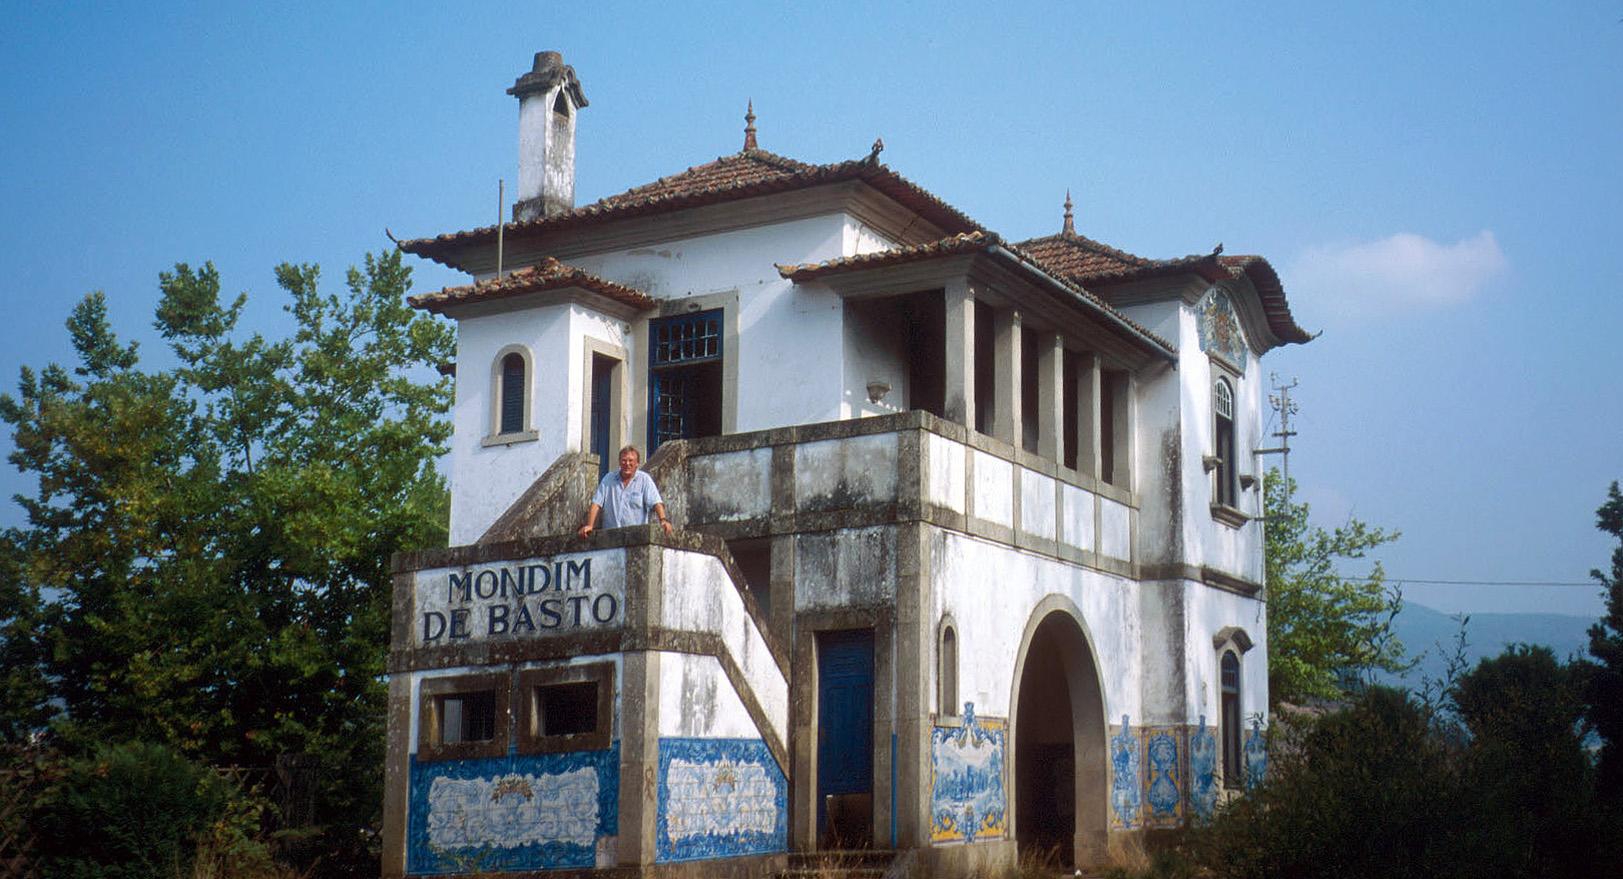 Mondim Station